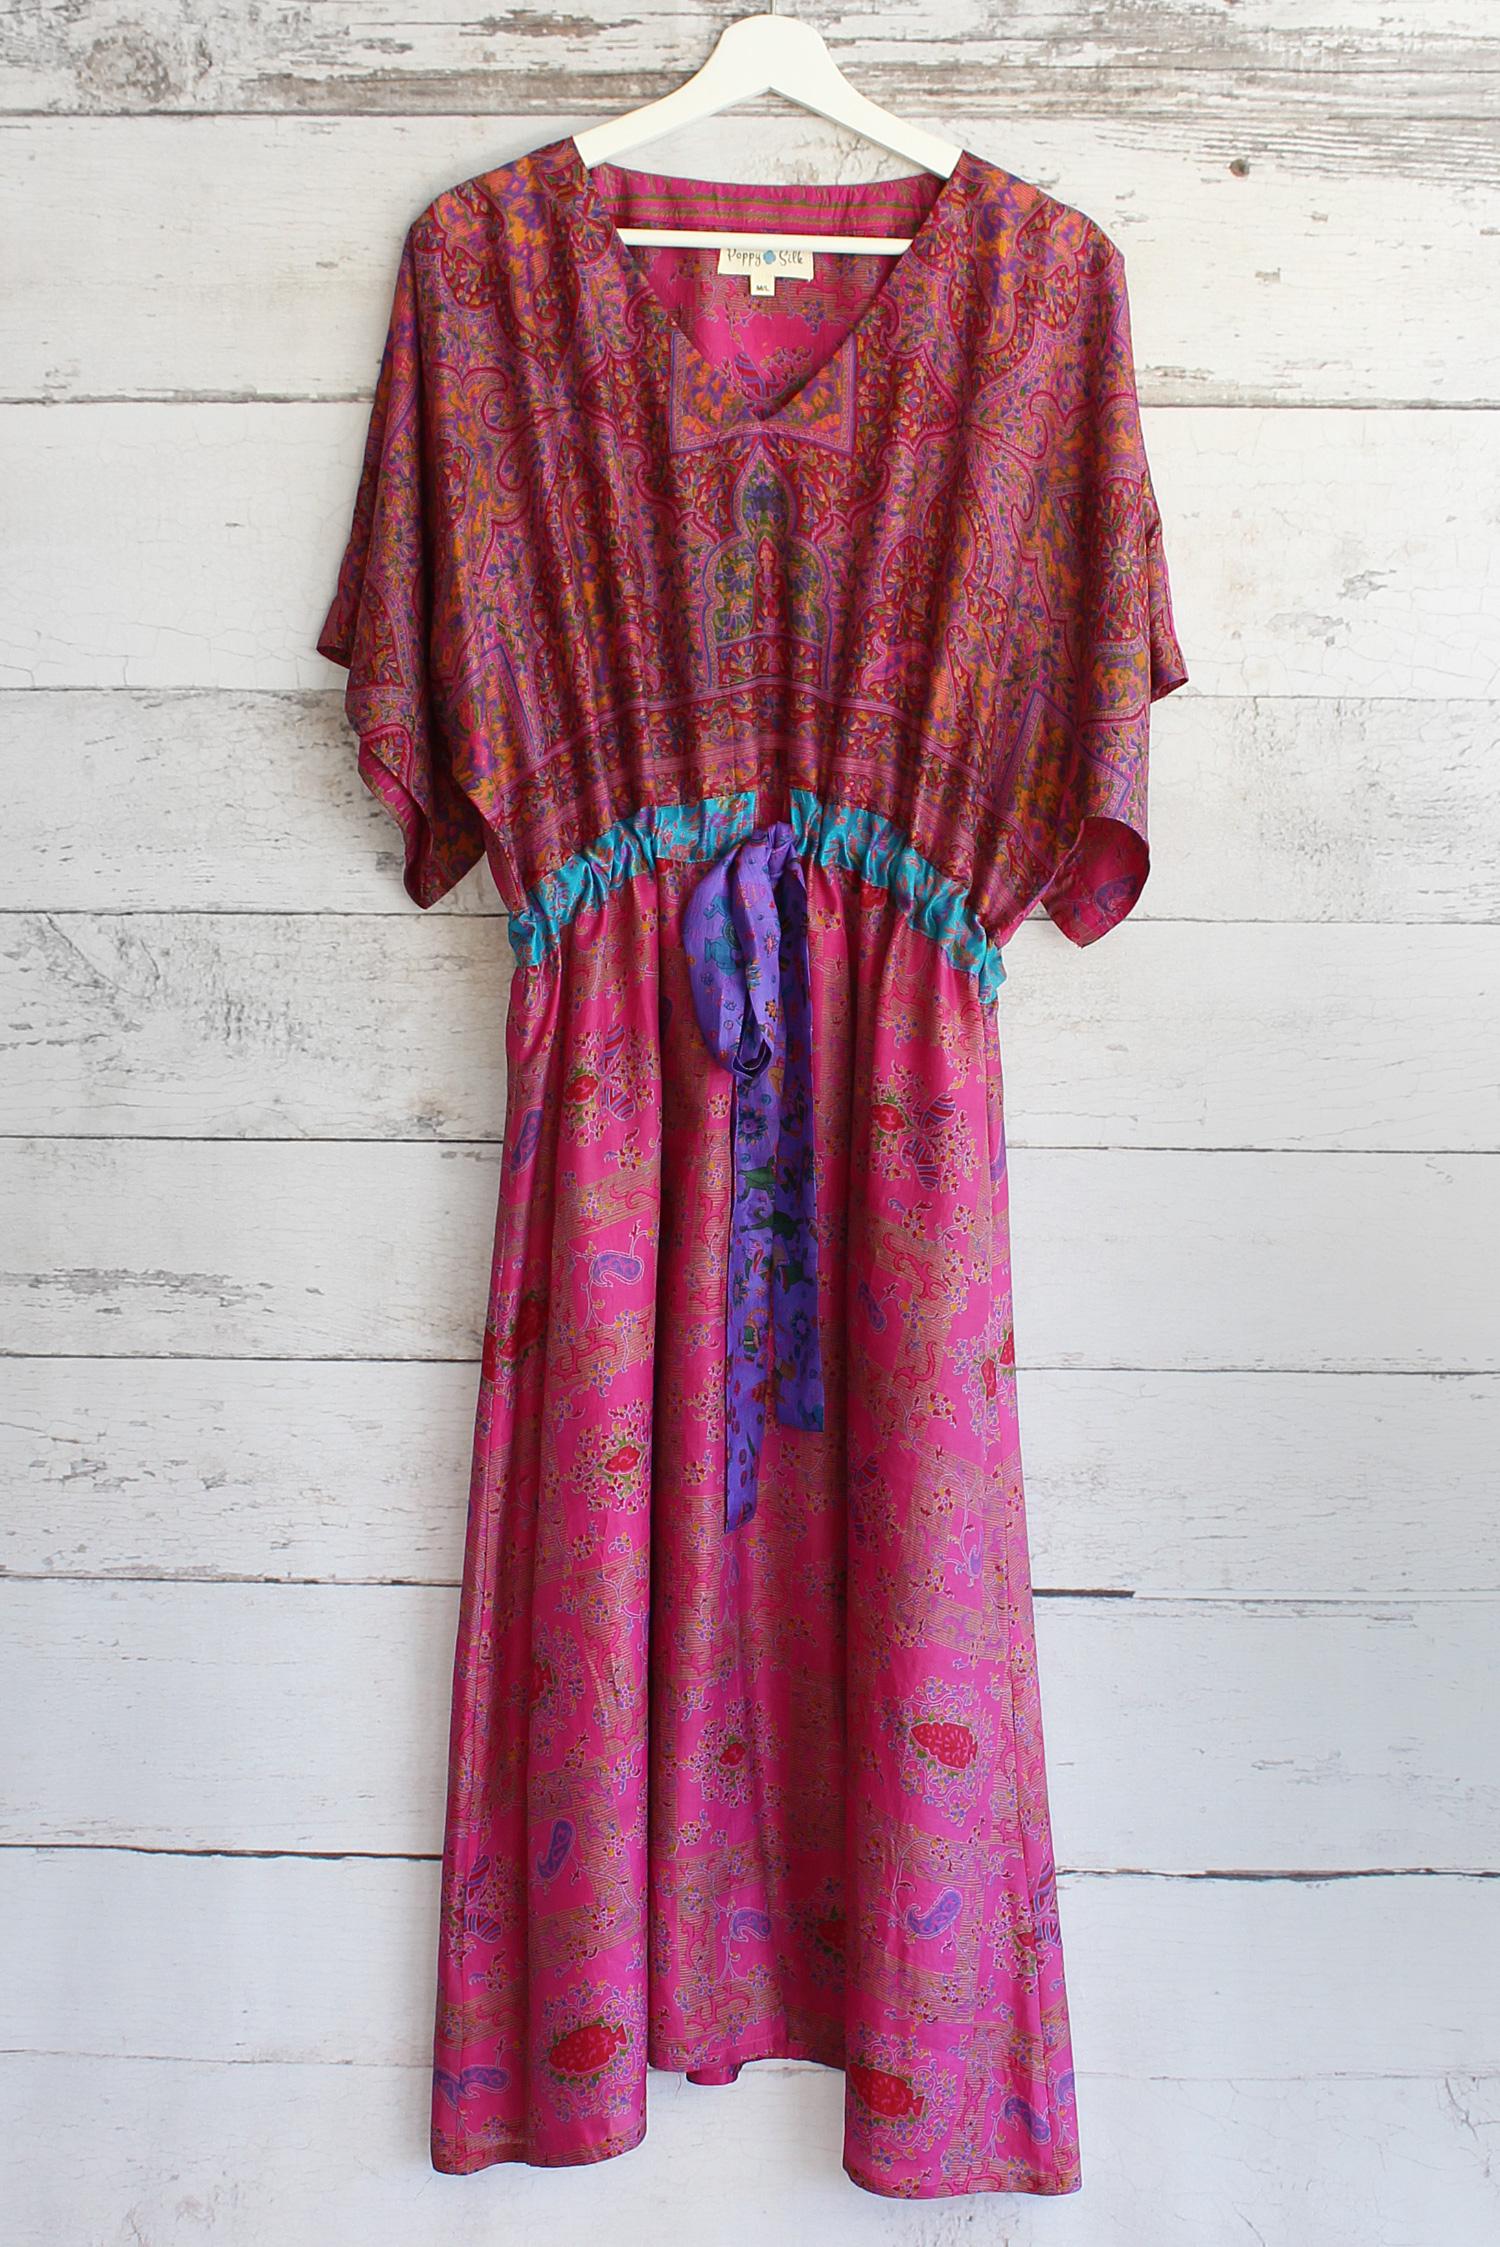 Jacinda Recycled Silk Sari Print Dress J29